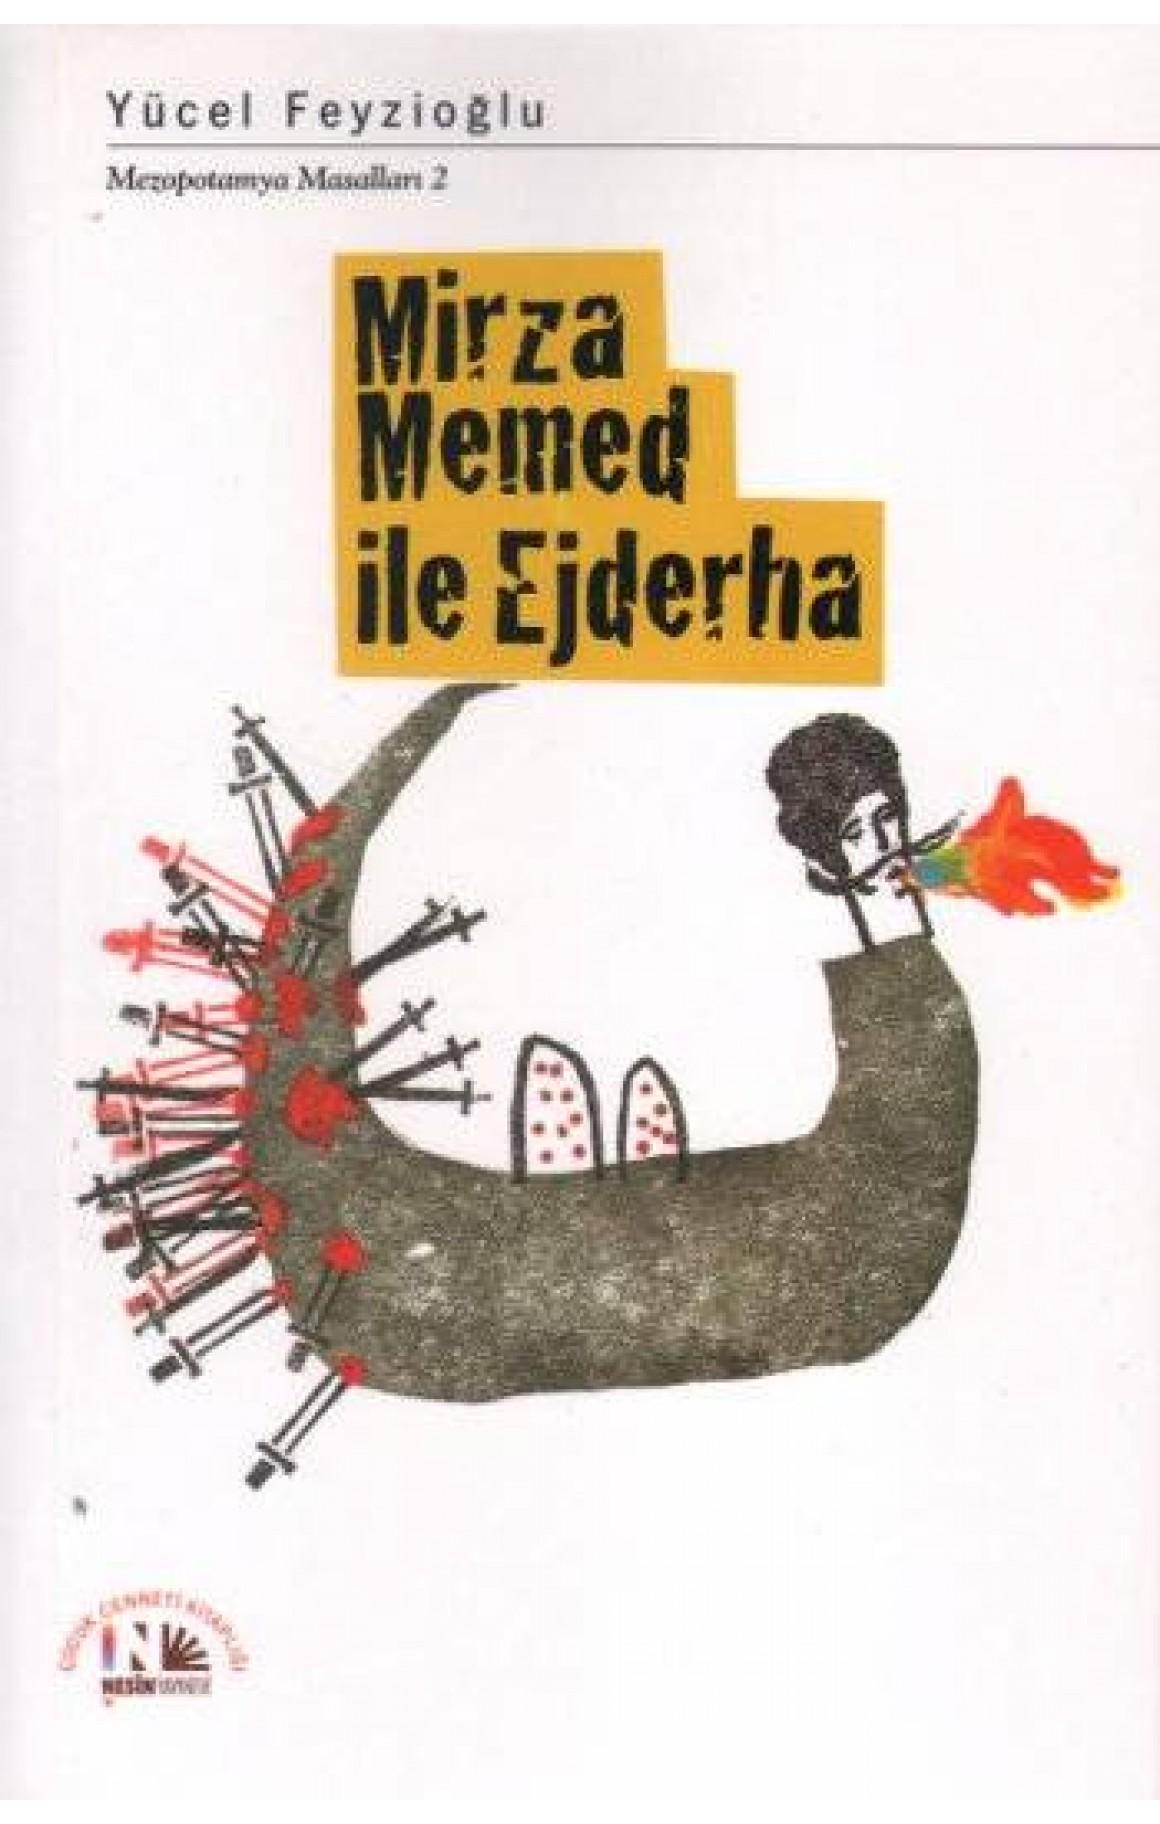 Mirza Memed ile Ejderha